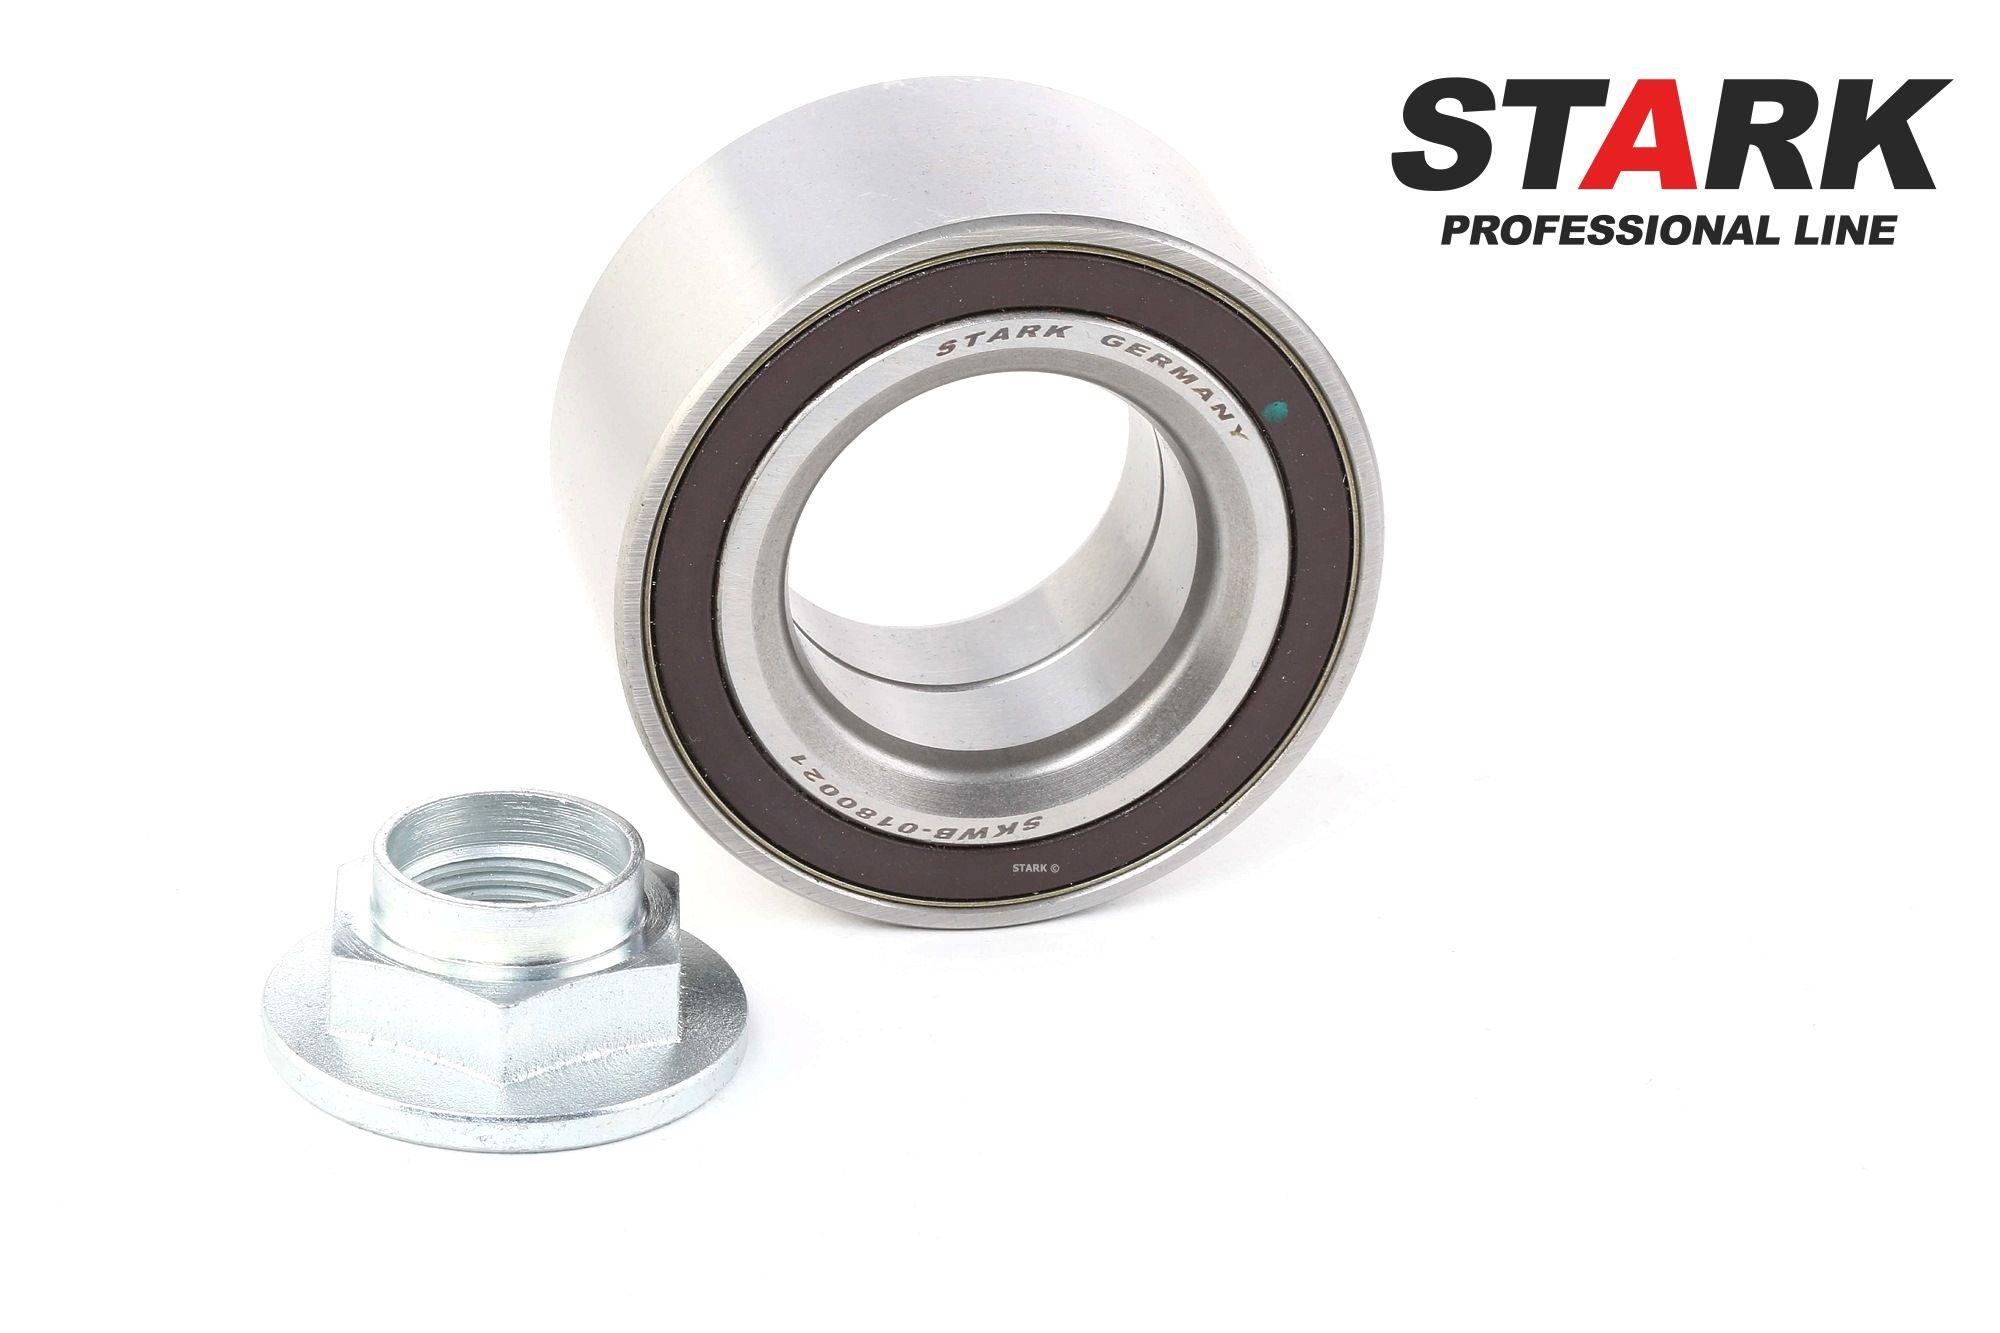 STARK: Original Lager SKWB-0180021 (Ø: 75,00mm, Innendurchmesser: 40,00mm)